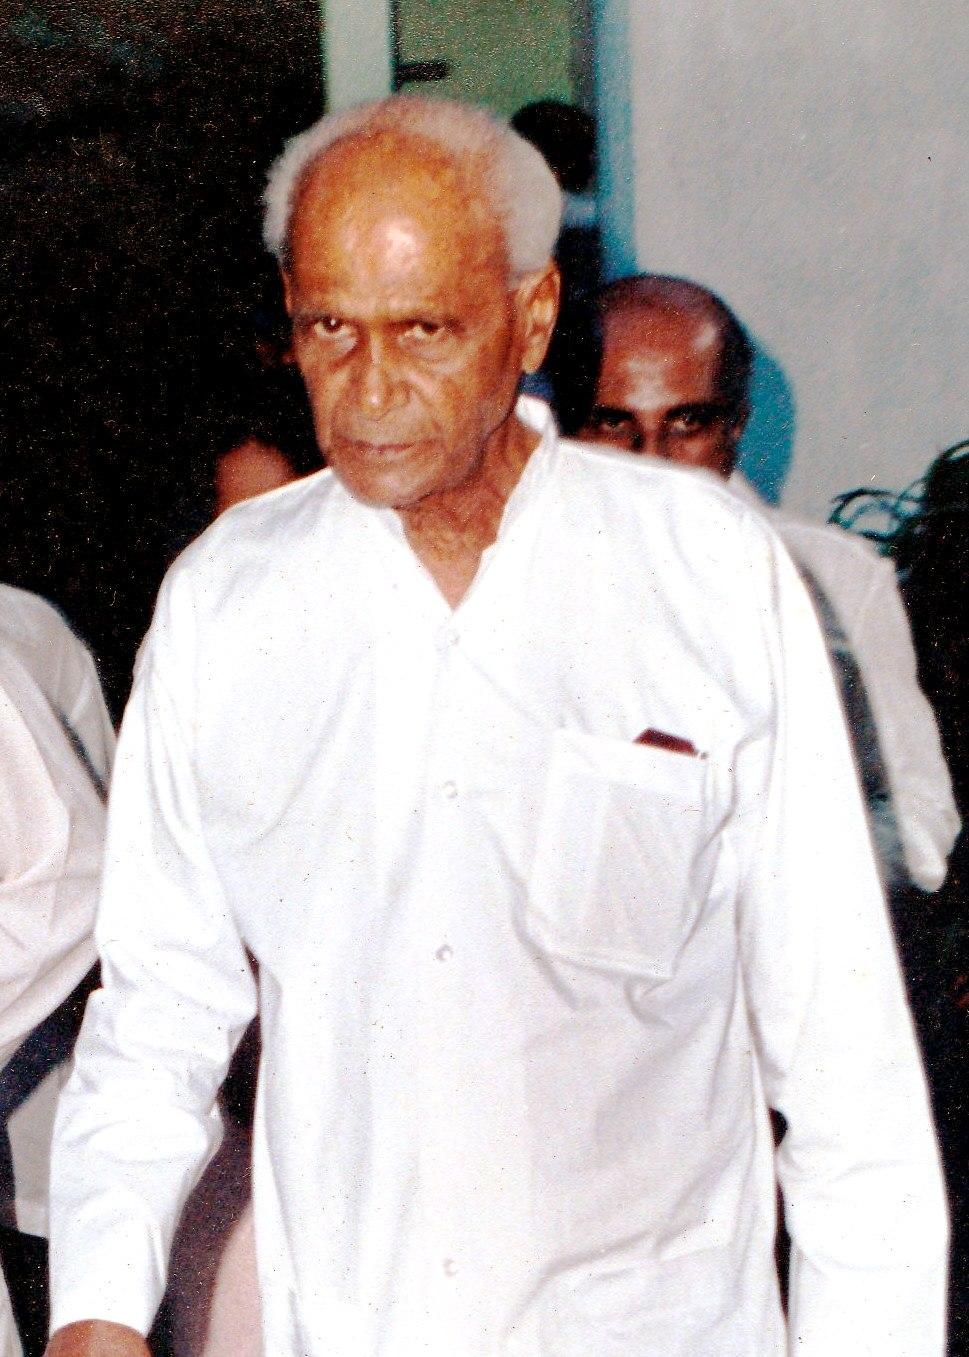 Wijeyananda Dahanayake portrait